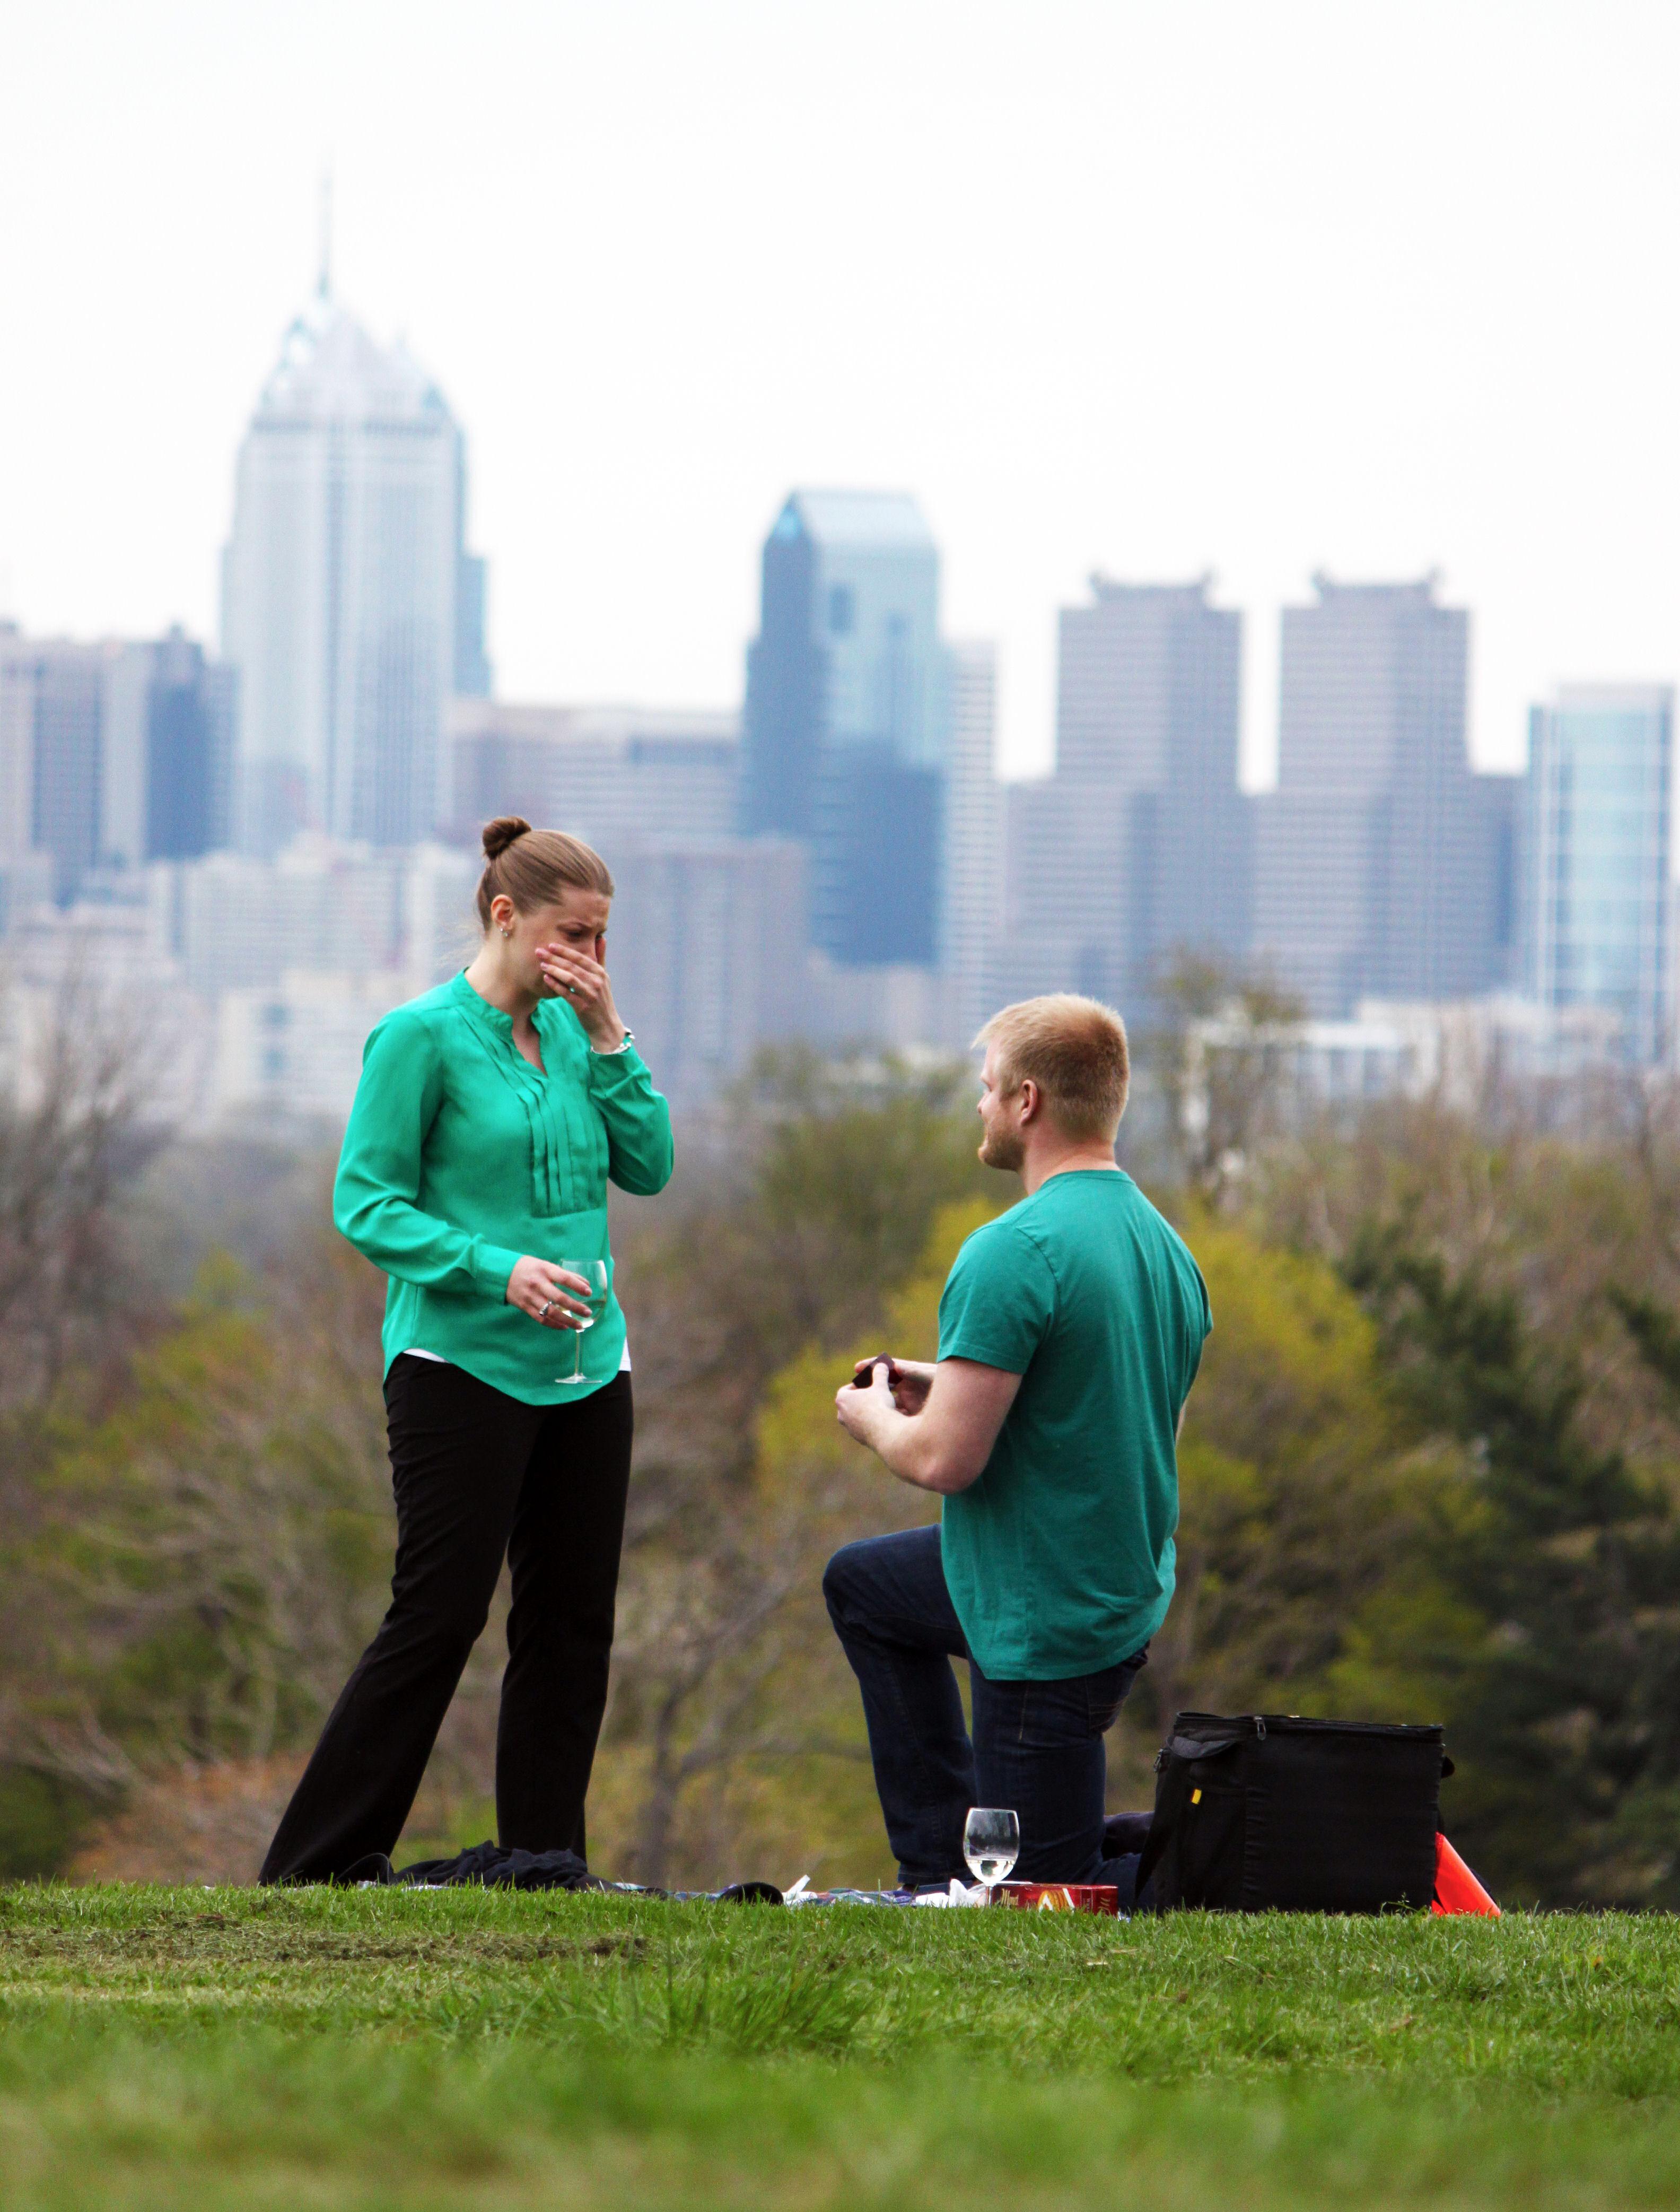 Image 5 of Amy and Tom   Philadelphia Marriage Proposal